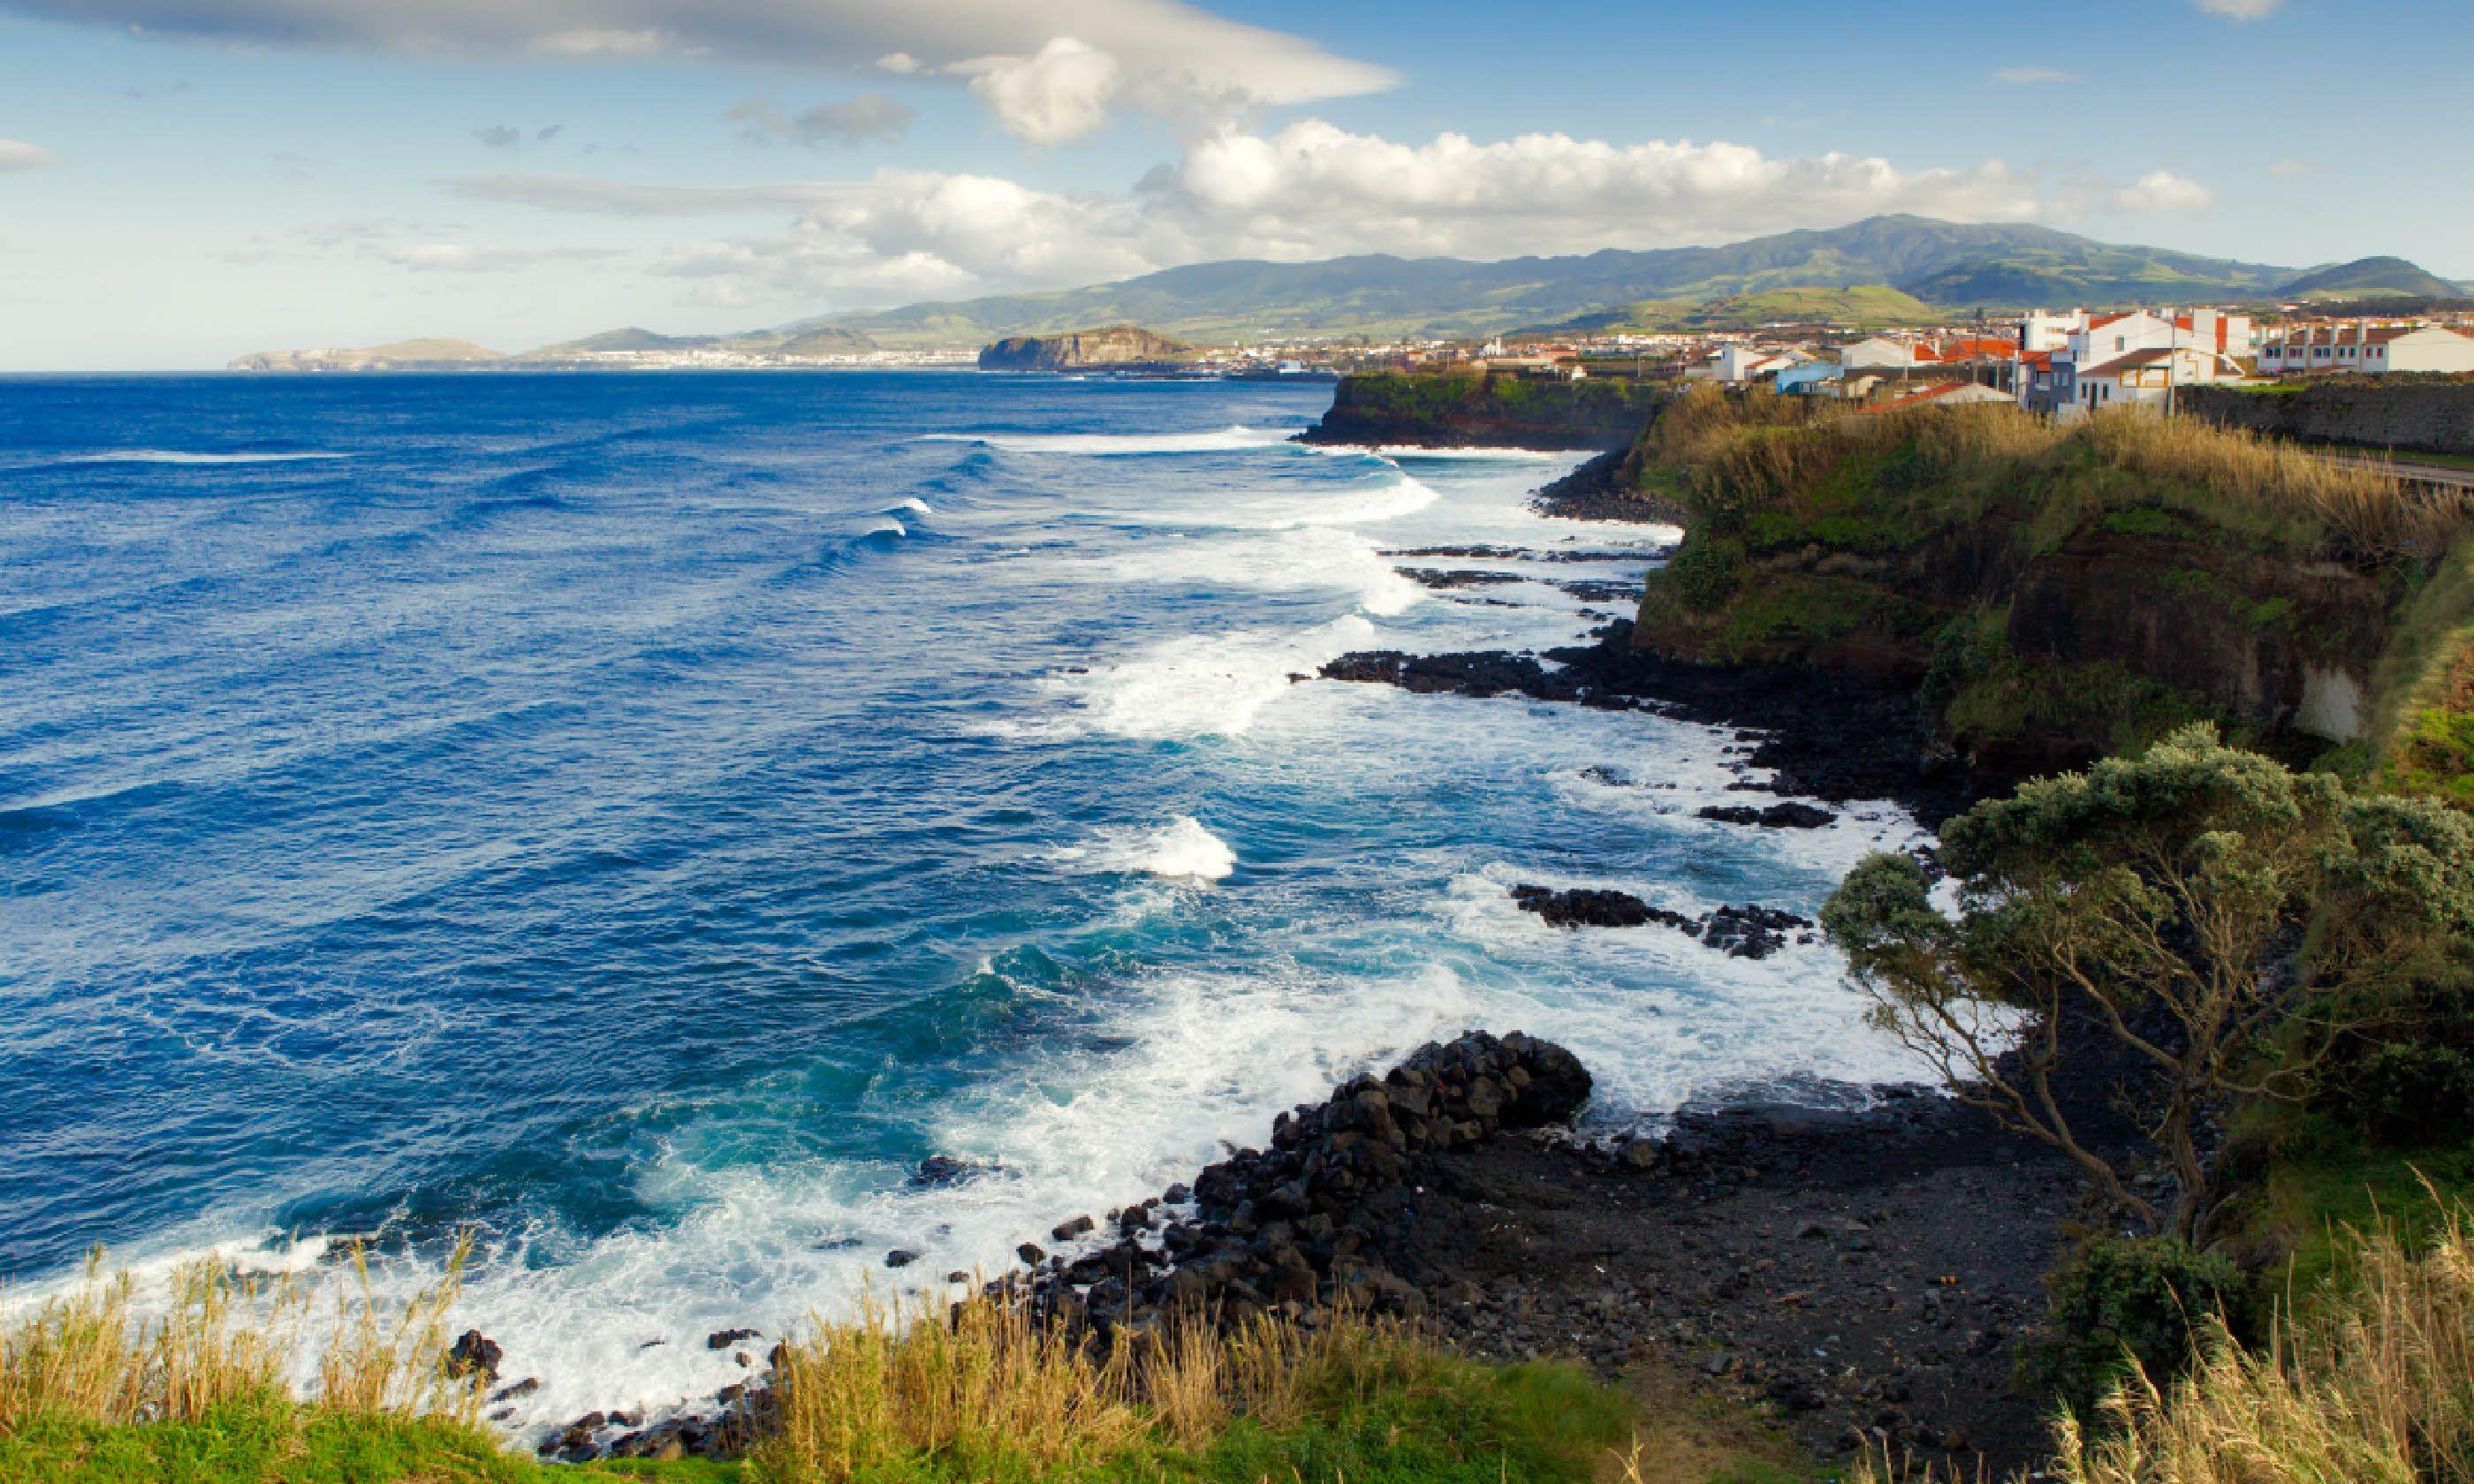 San Miguel, Azores (Shutterstock)